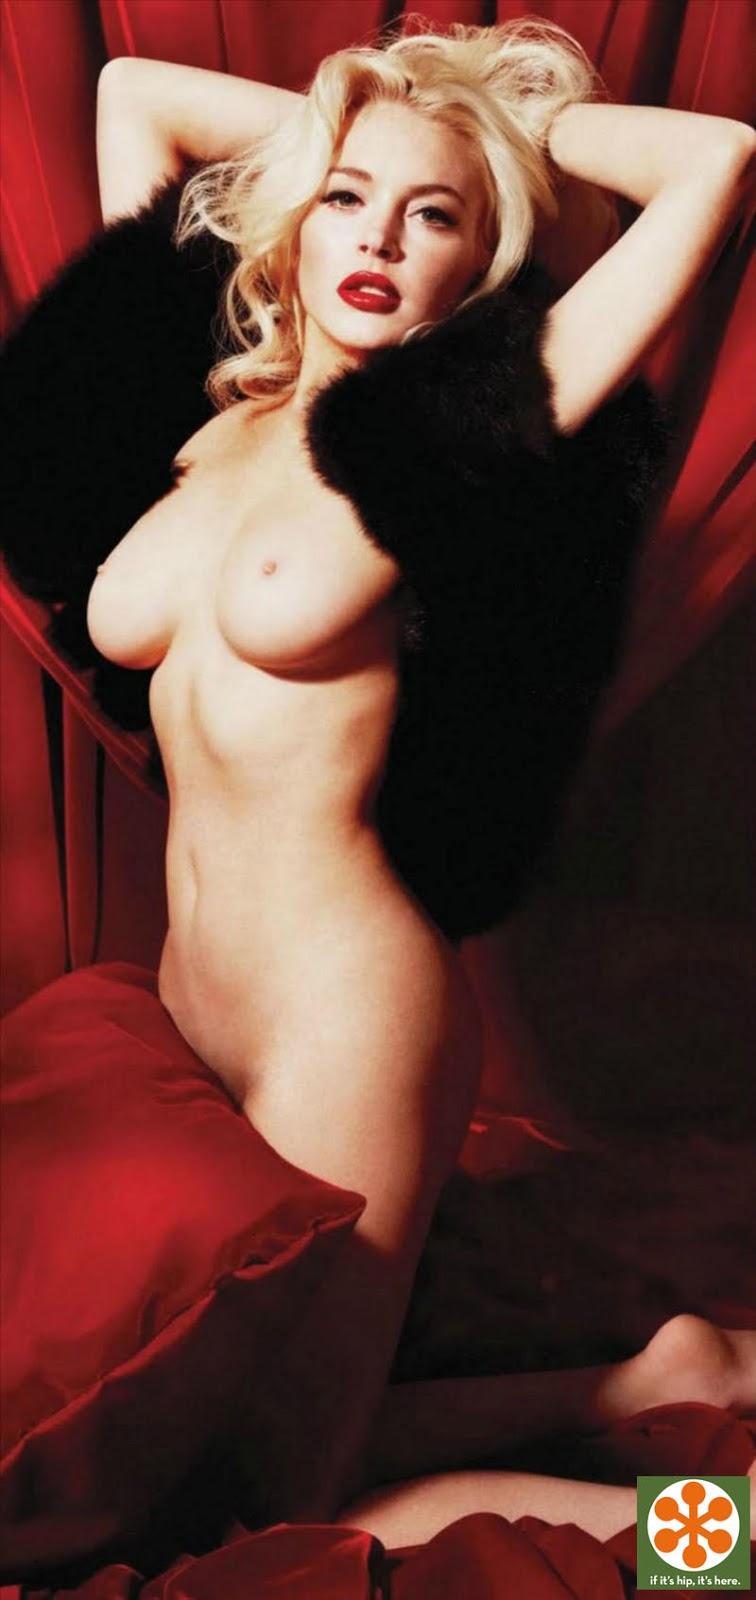 Lindsey lohan poses nude as maralin monroe